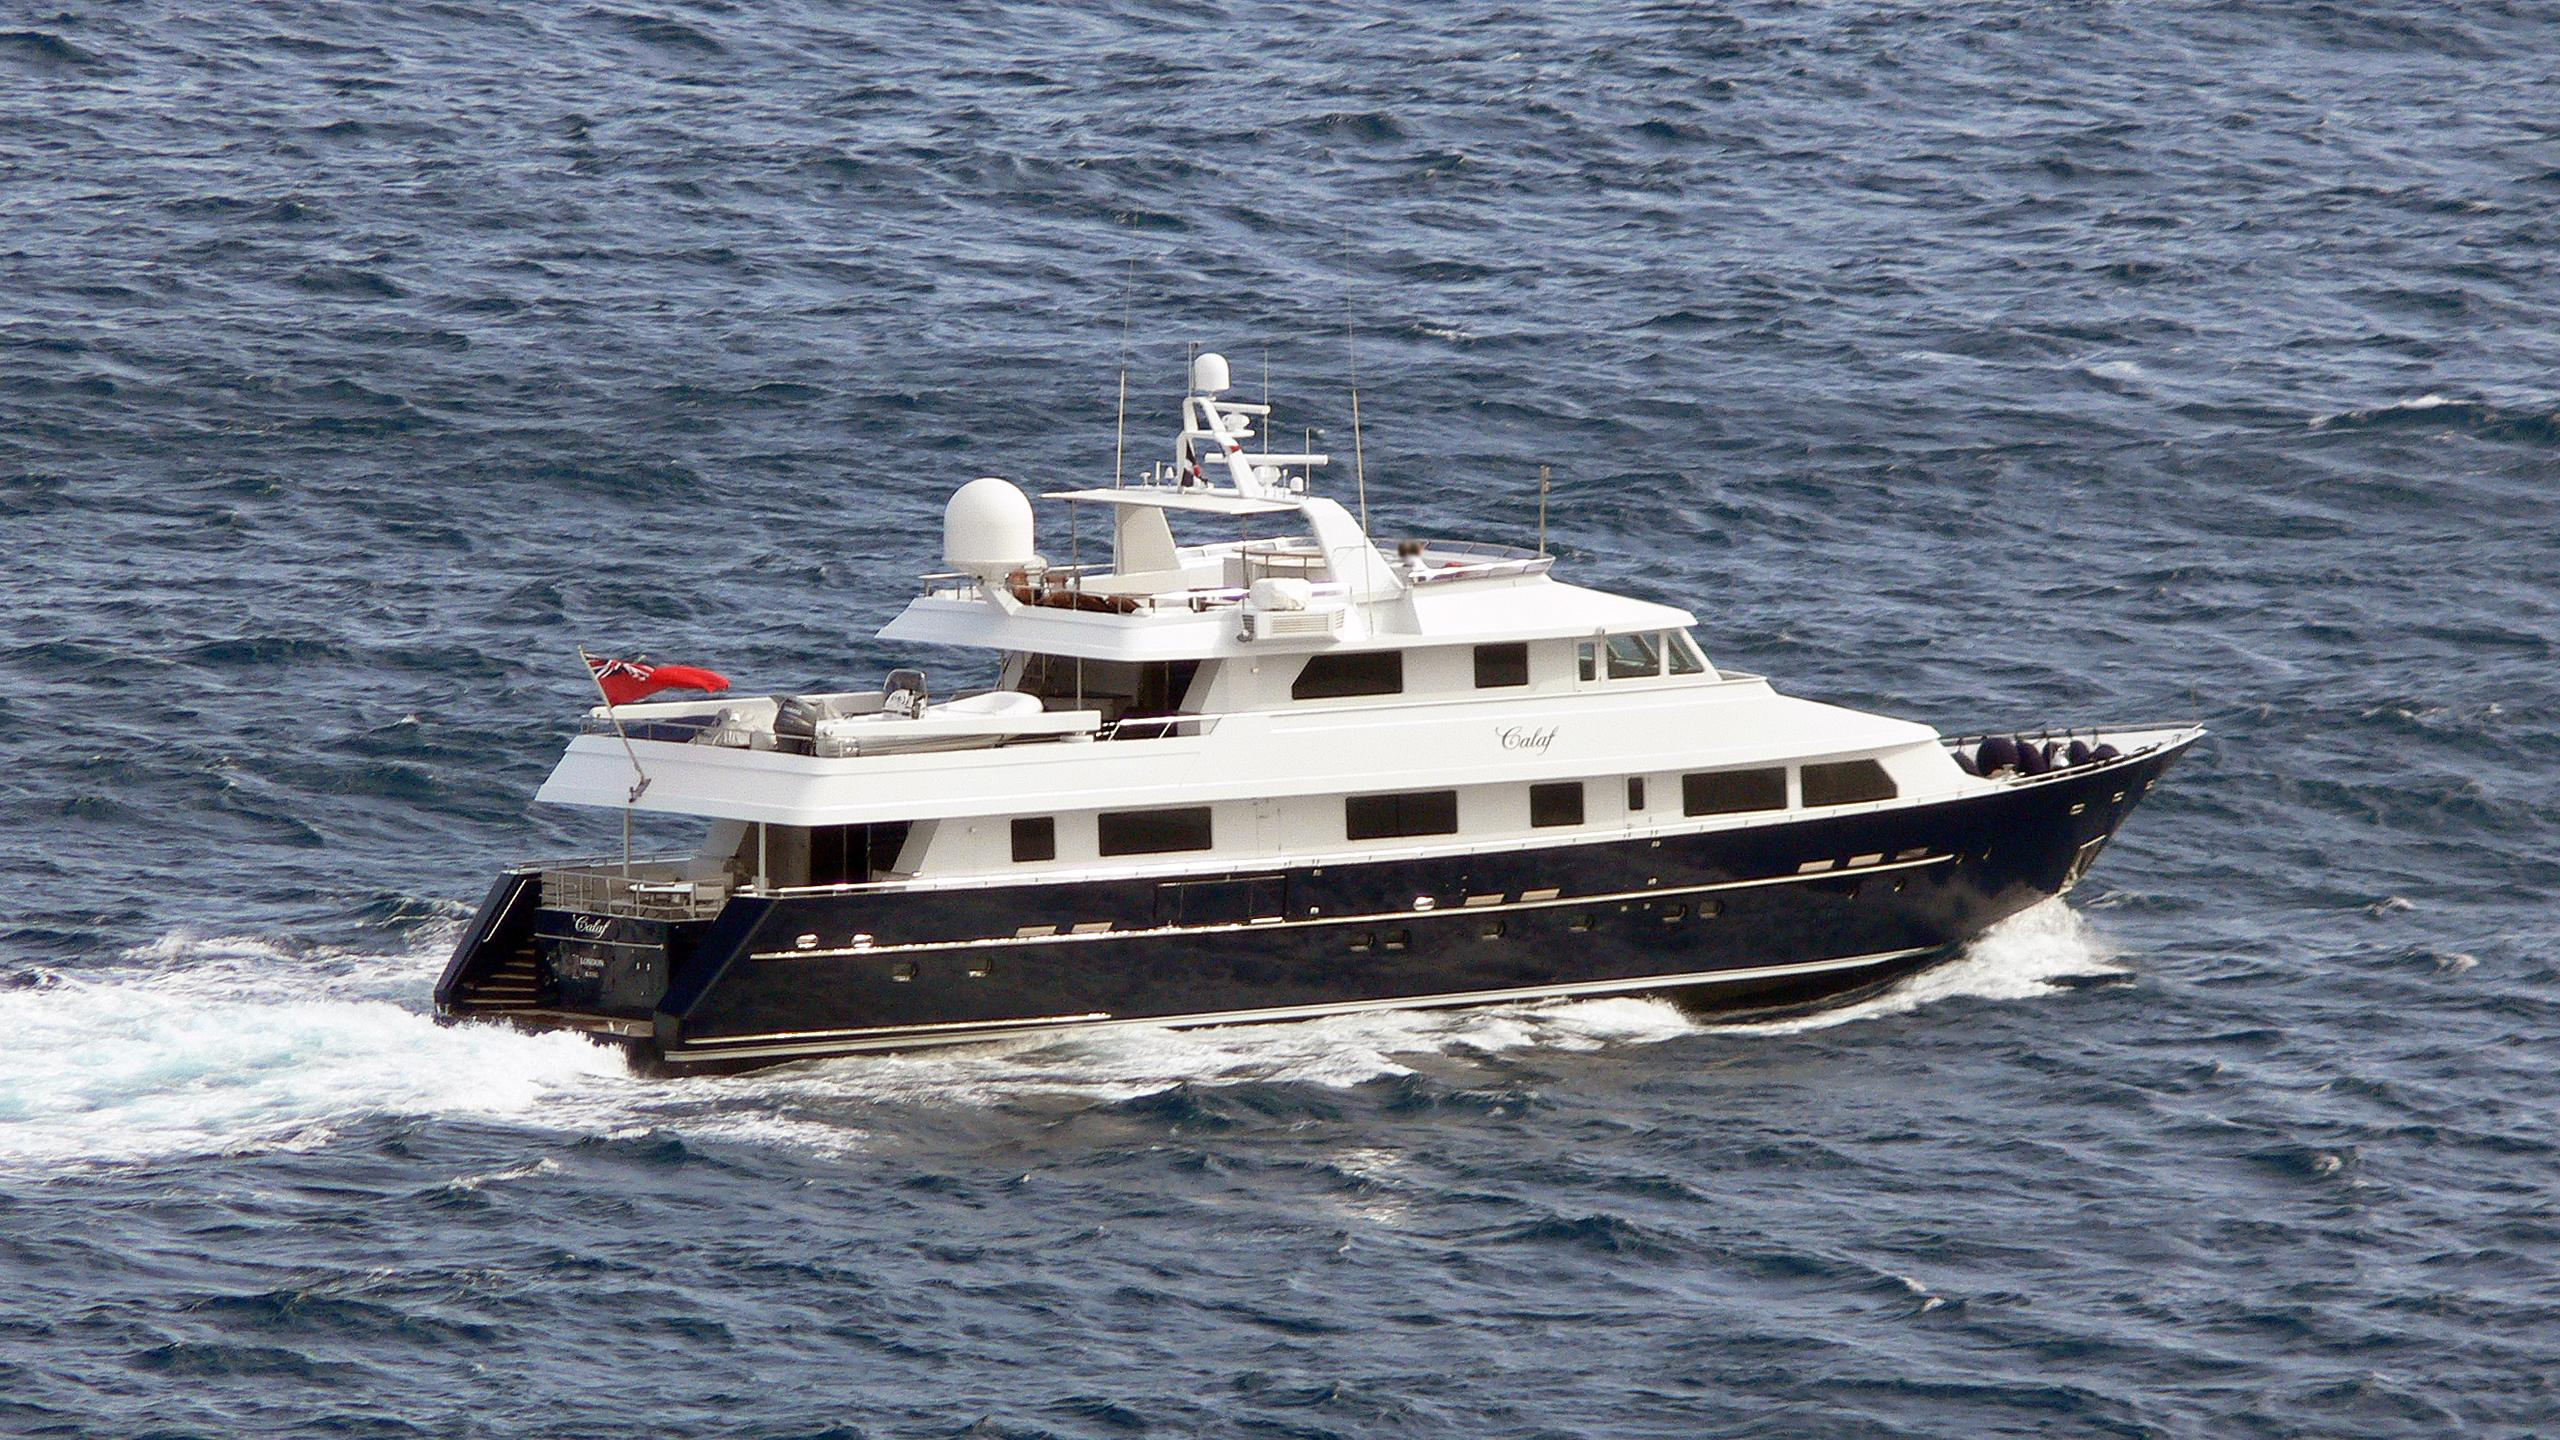 magix-motor-yacht-heesen-1992-37m-cruising-half-profile